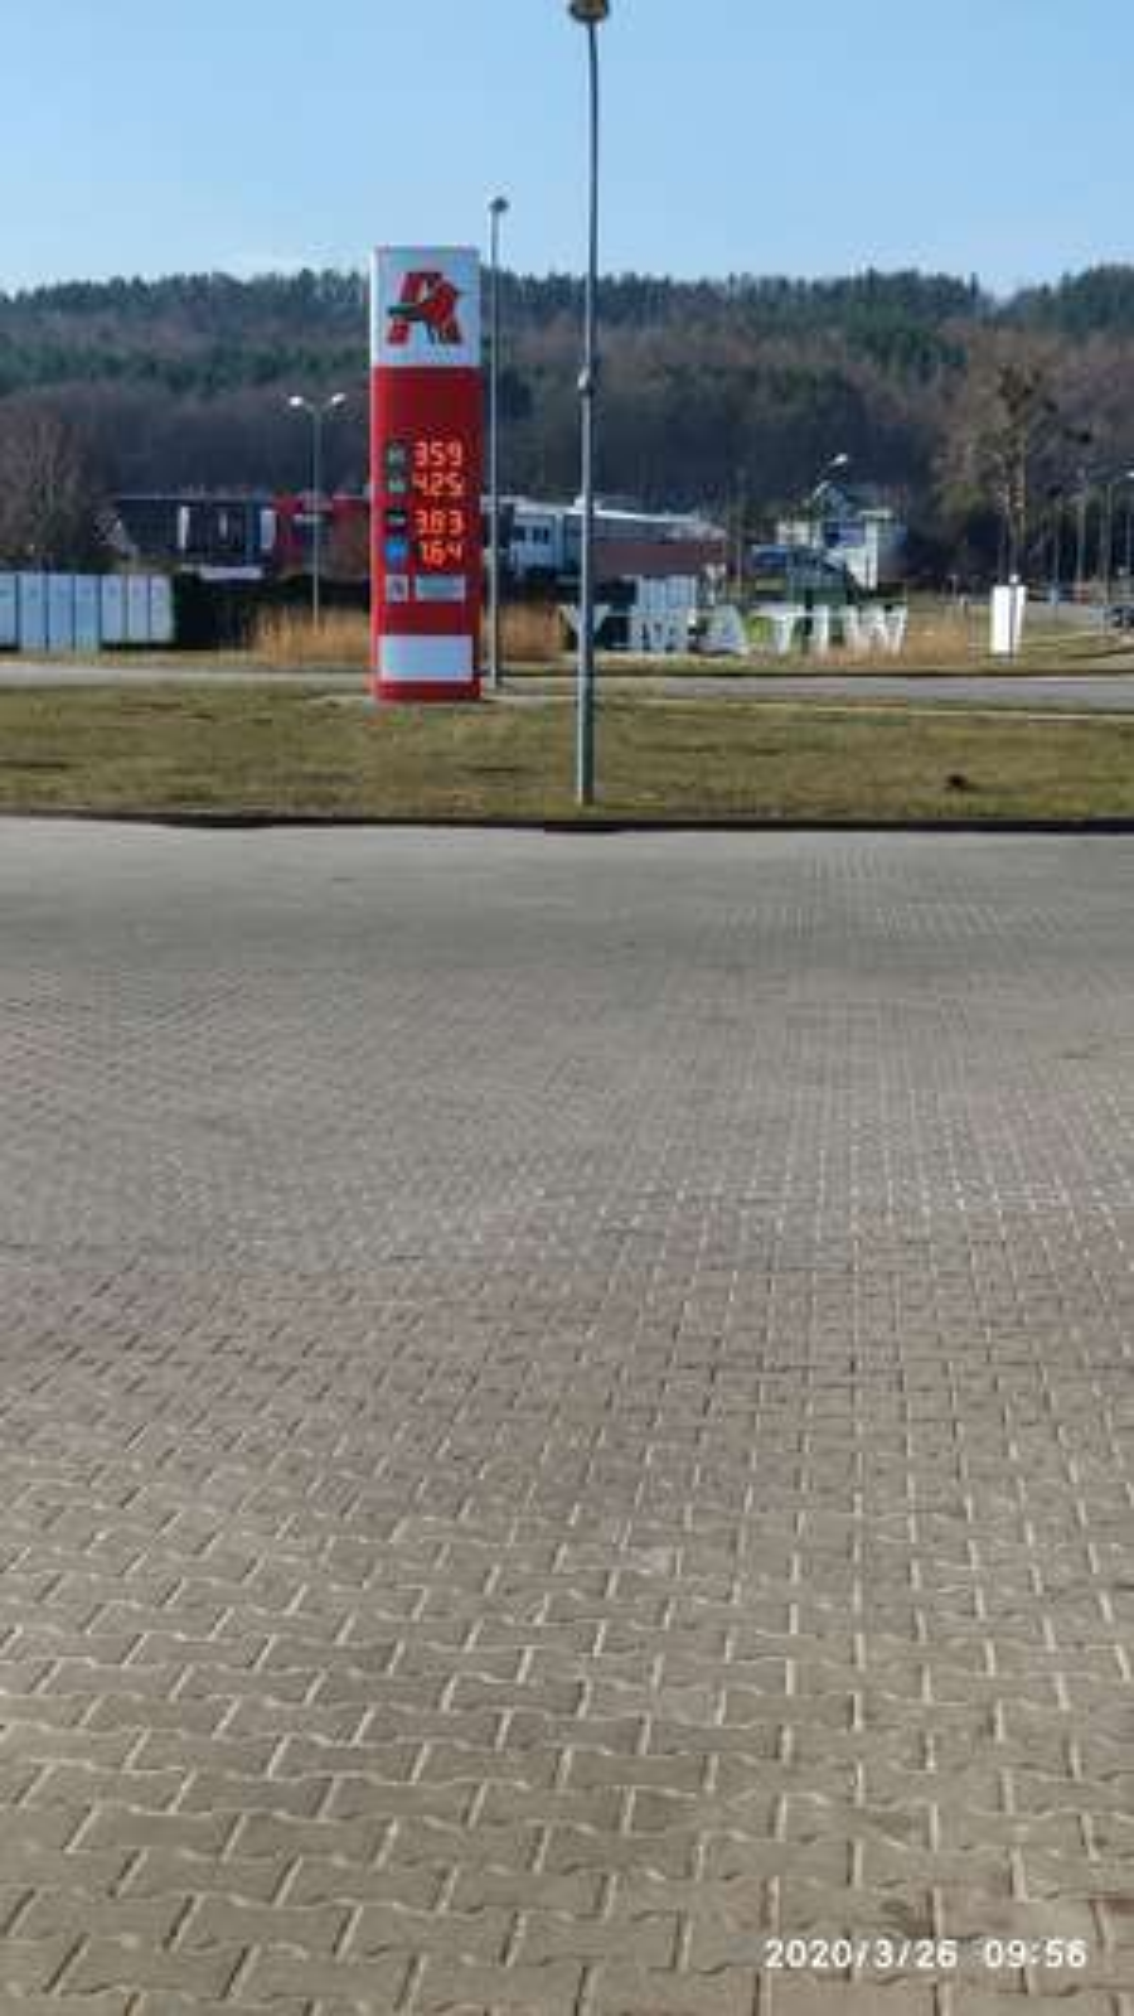 Paliwo Auchan Rumia Pb 95 - 3,57 zł